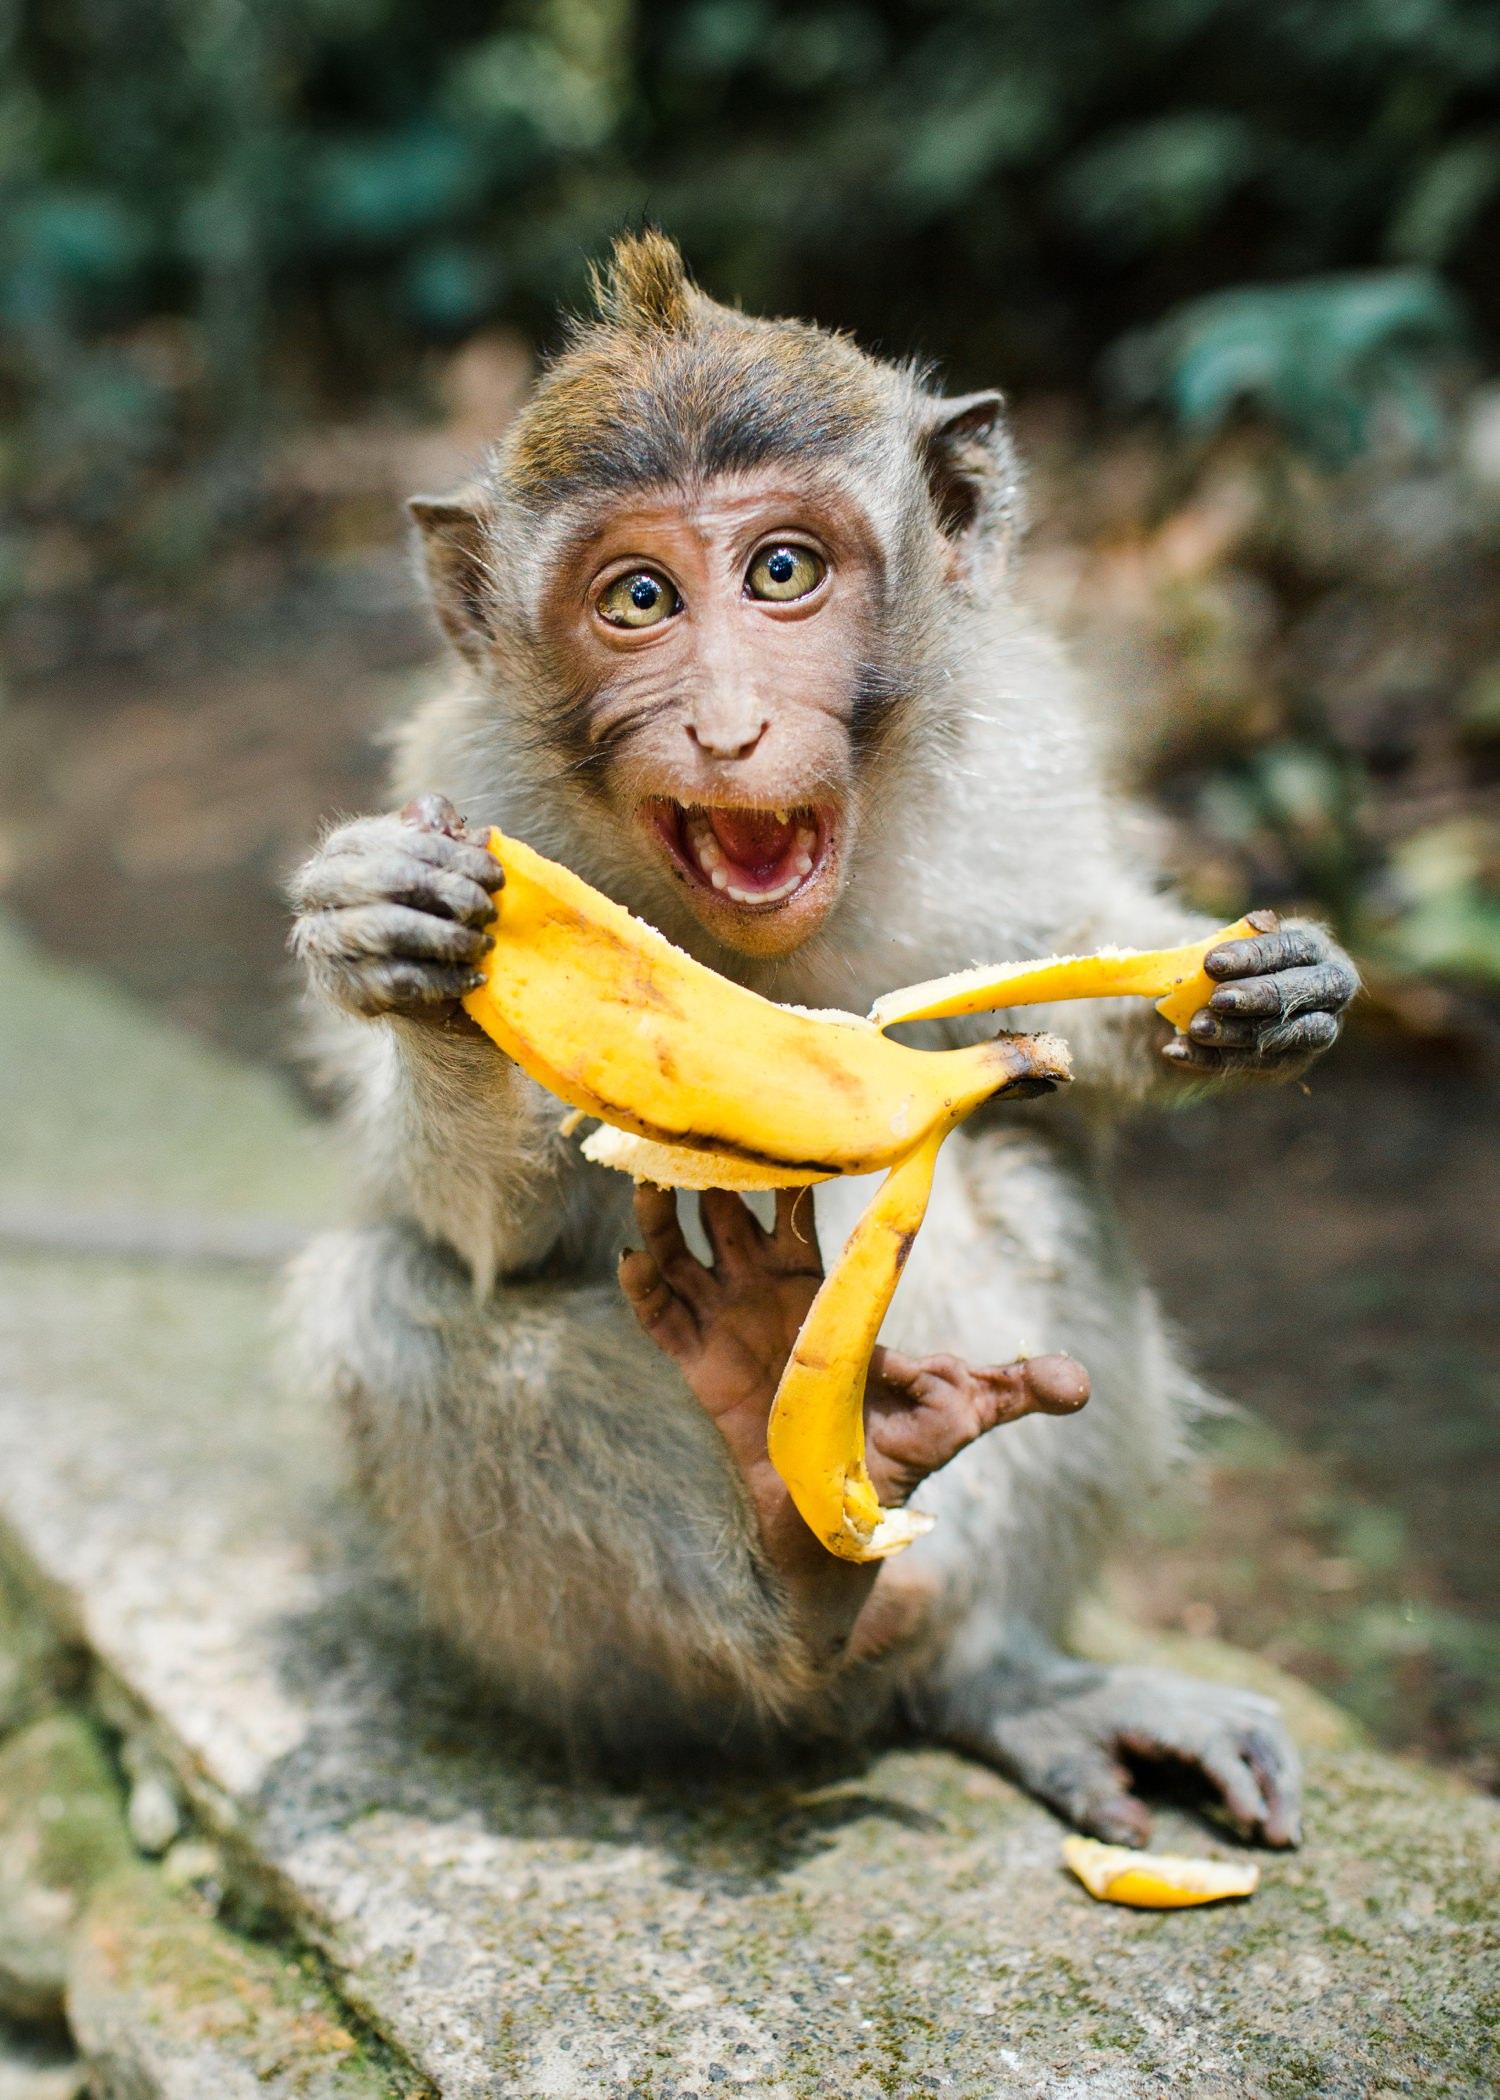 bali-monkey-cameron-zegers-travel-photographer.jpg